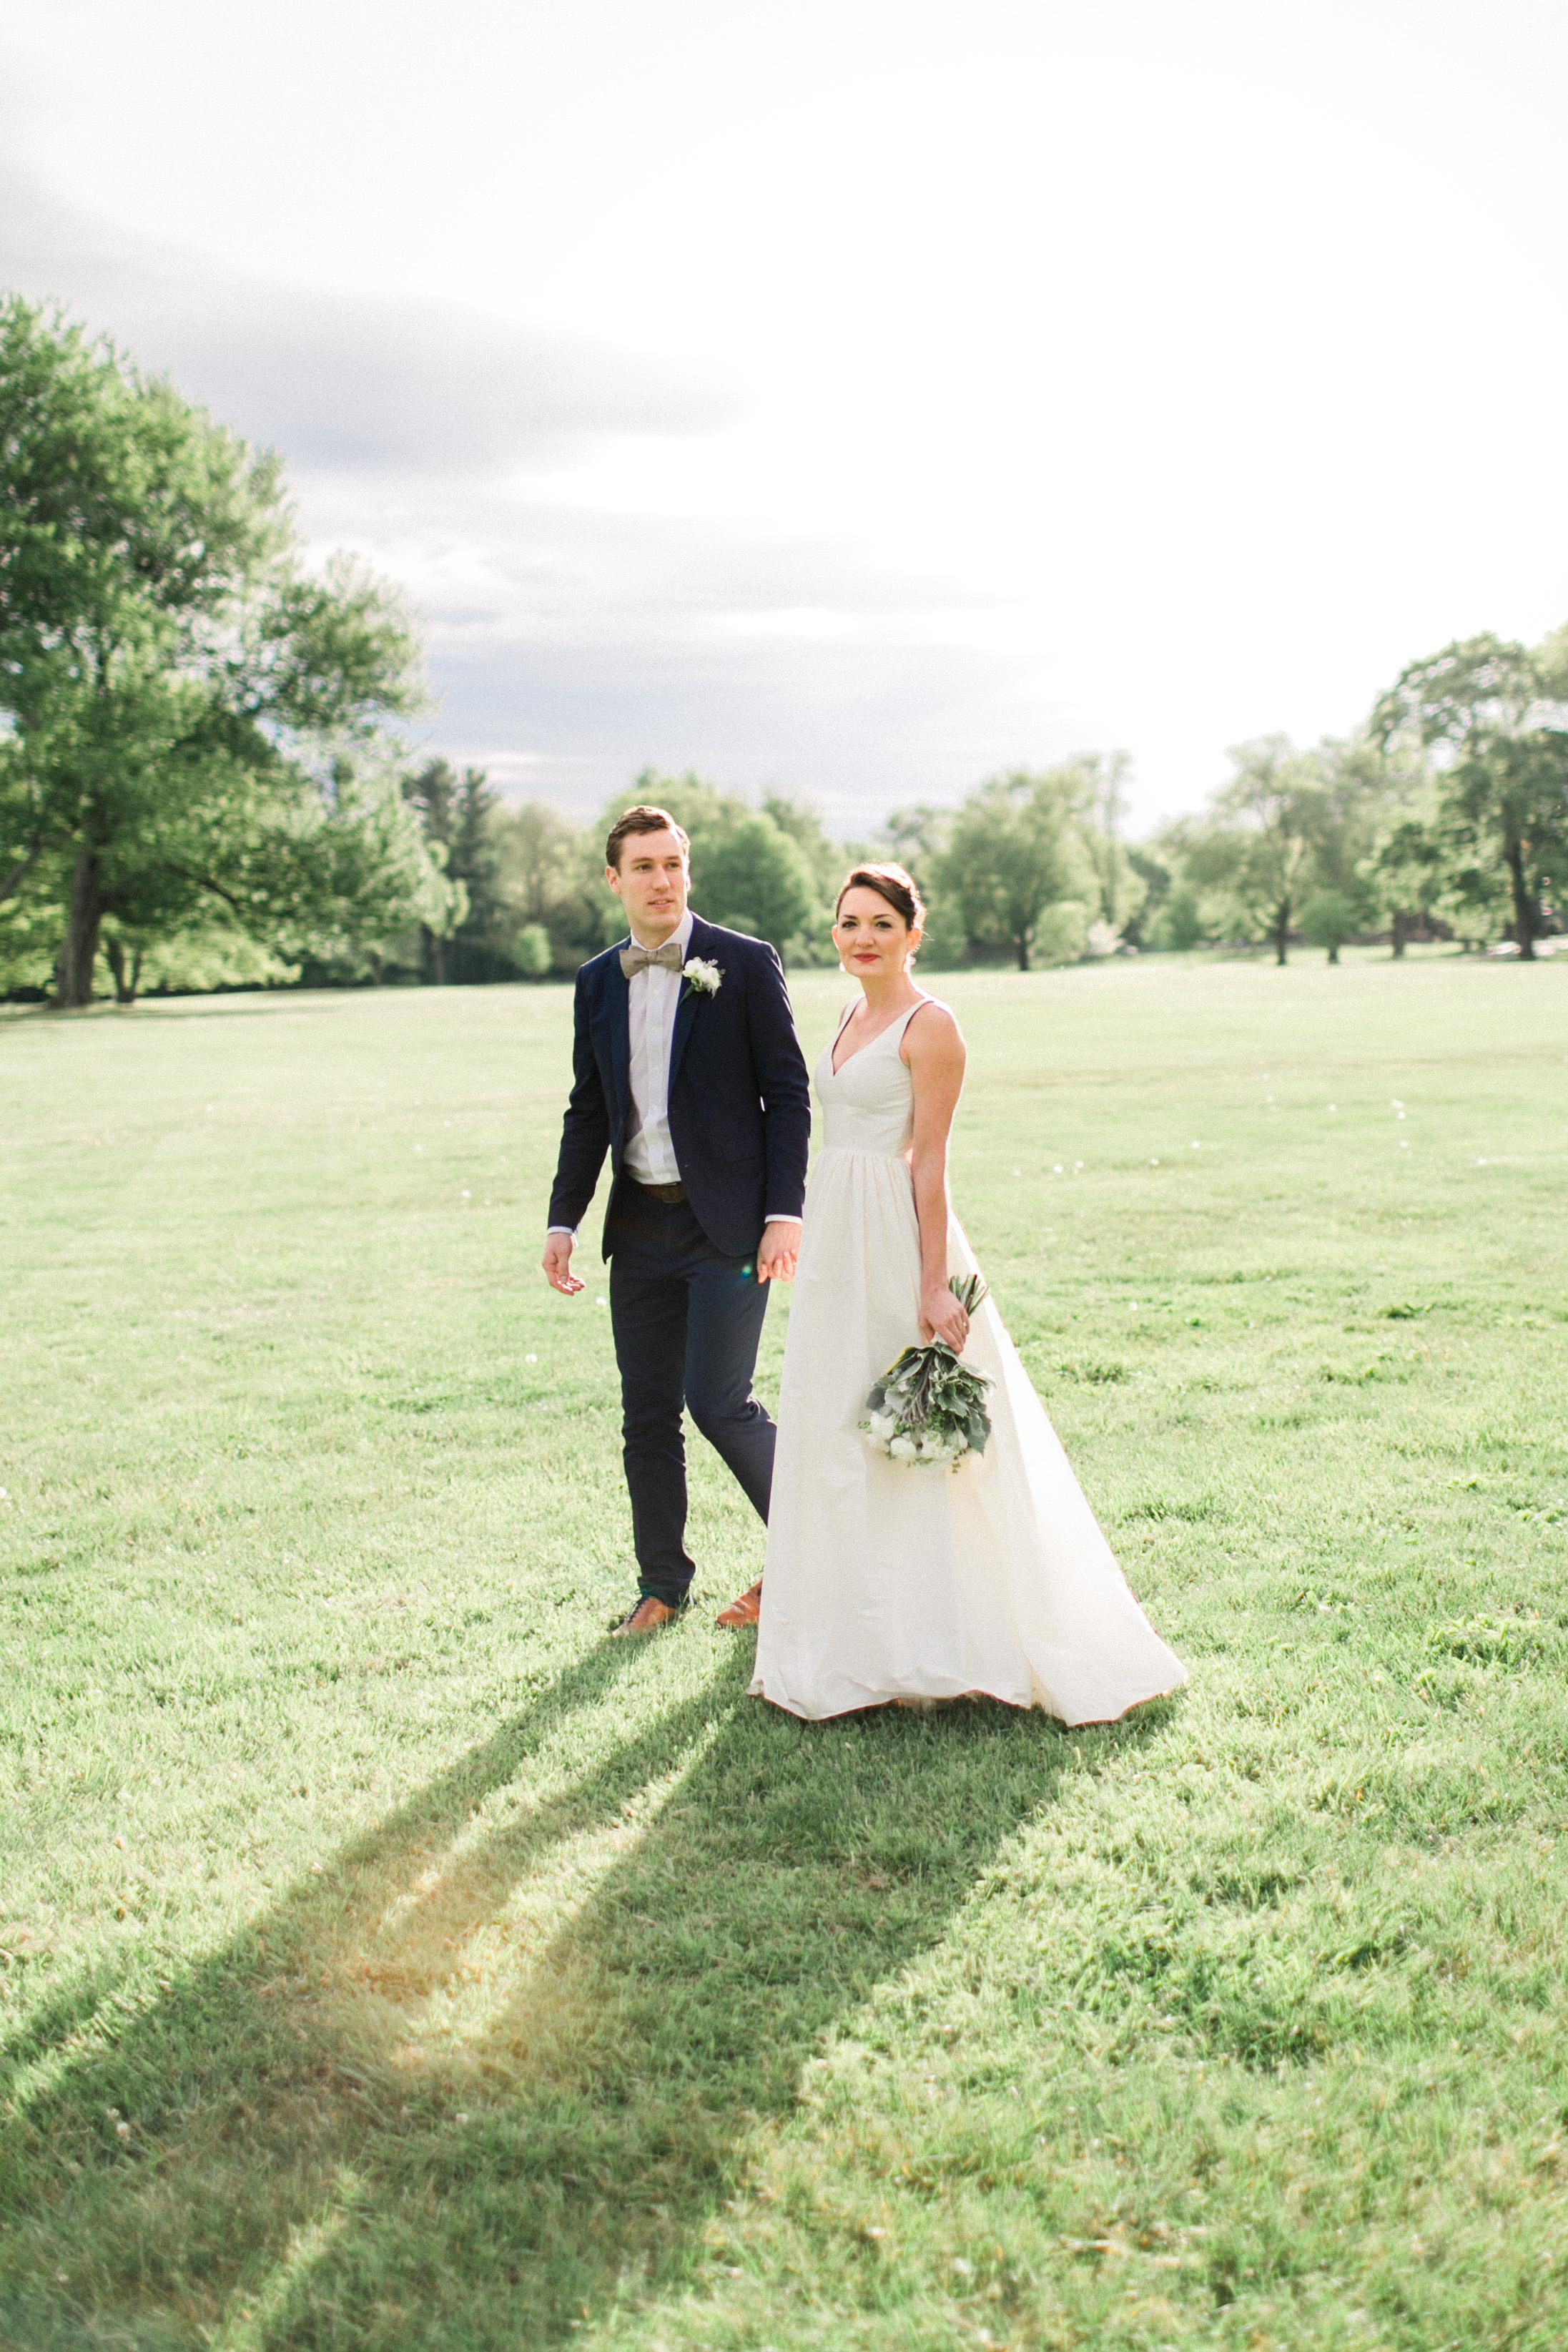 mayden photography weddings-105.jpg